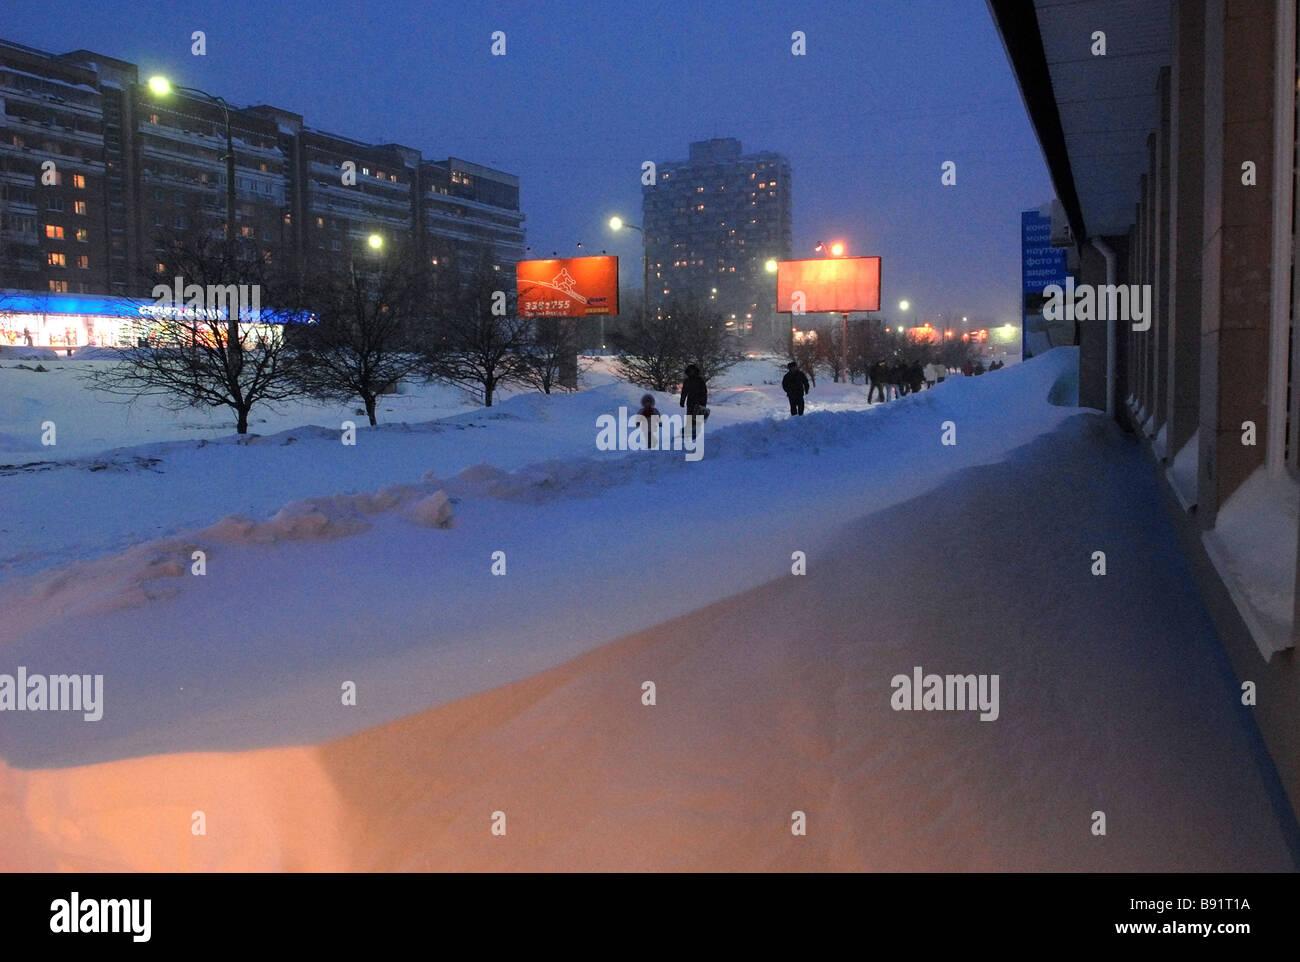 Heavy snowfall aftermath in Samara - Stock Image